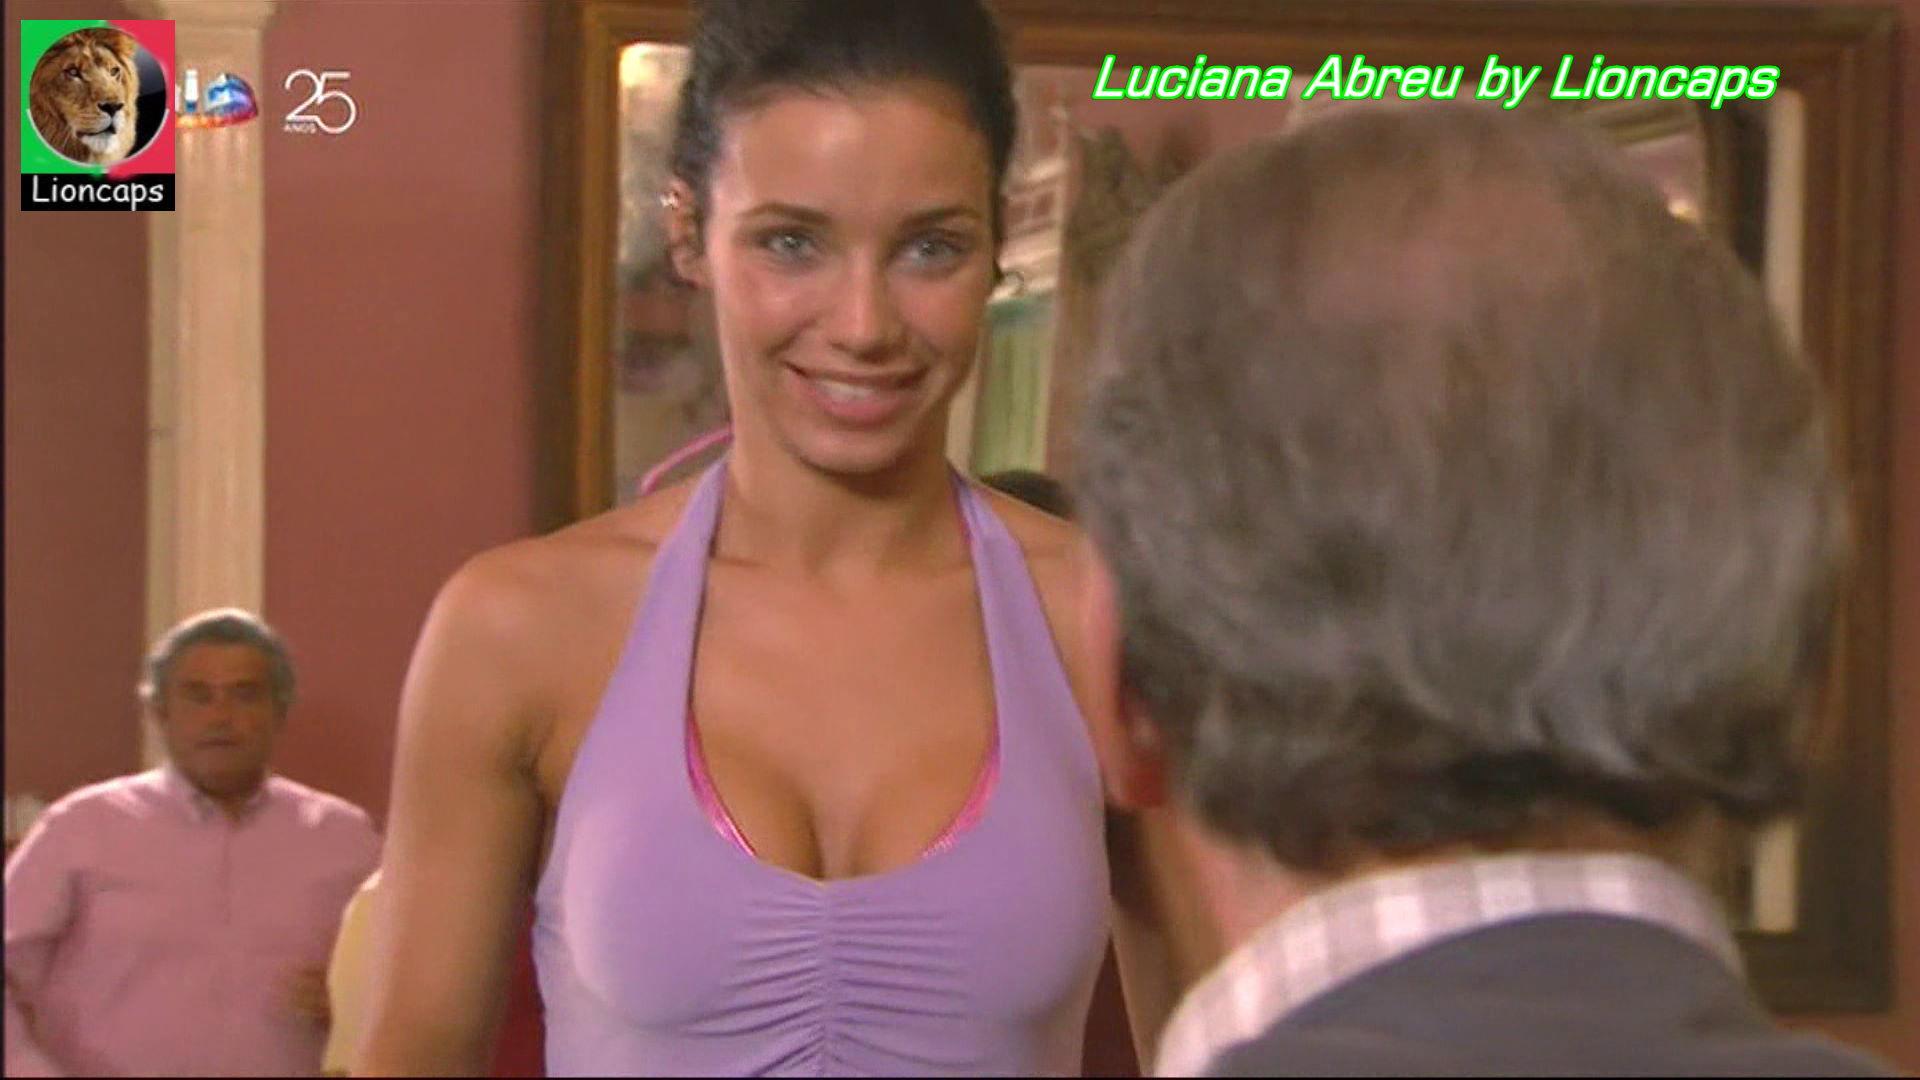 159915773_luciana_abreu_vs170911_0171_122_401lo.JPG